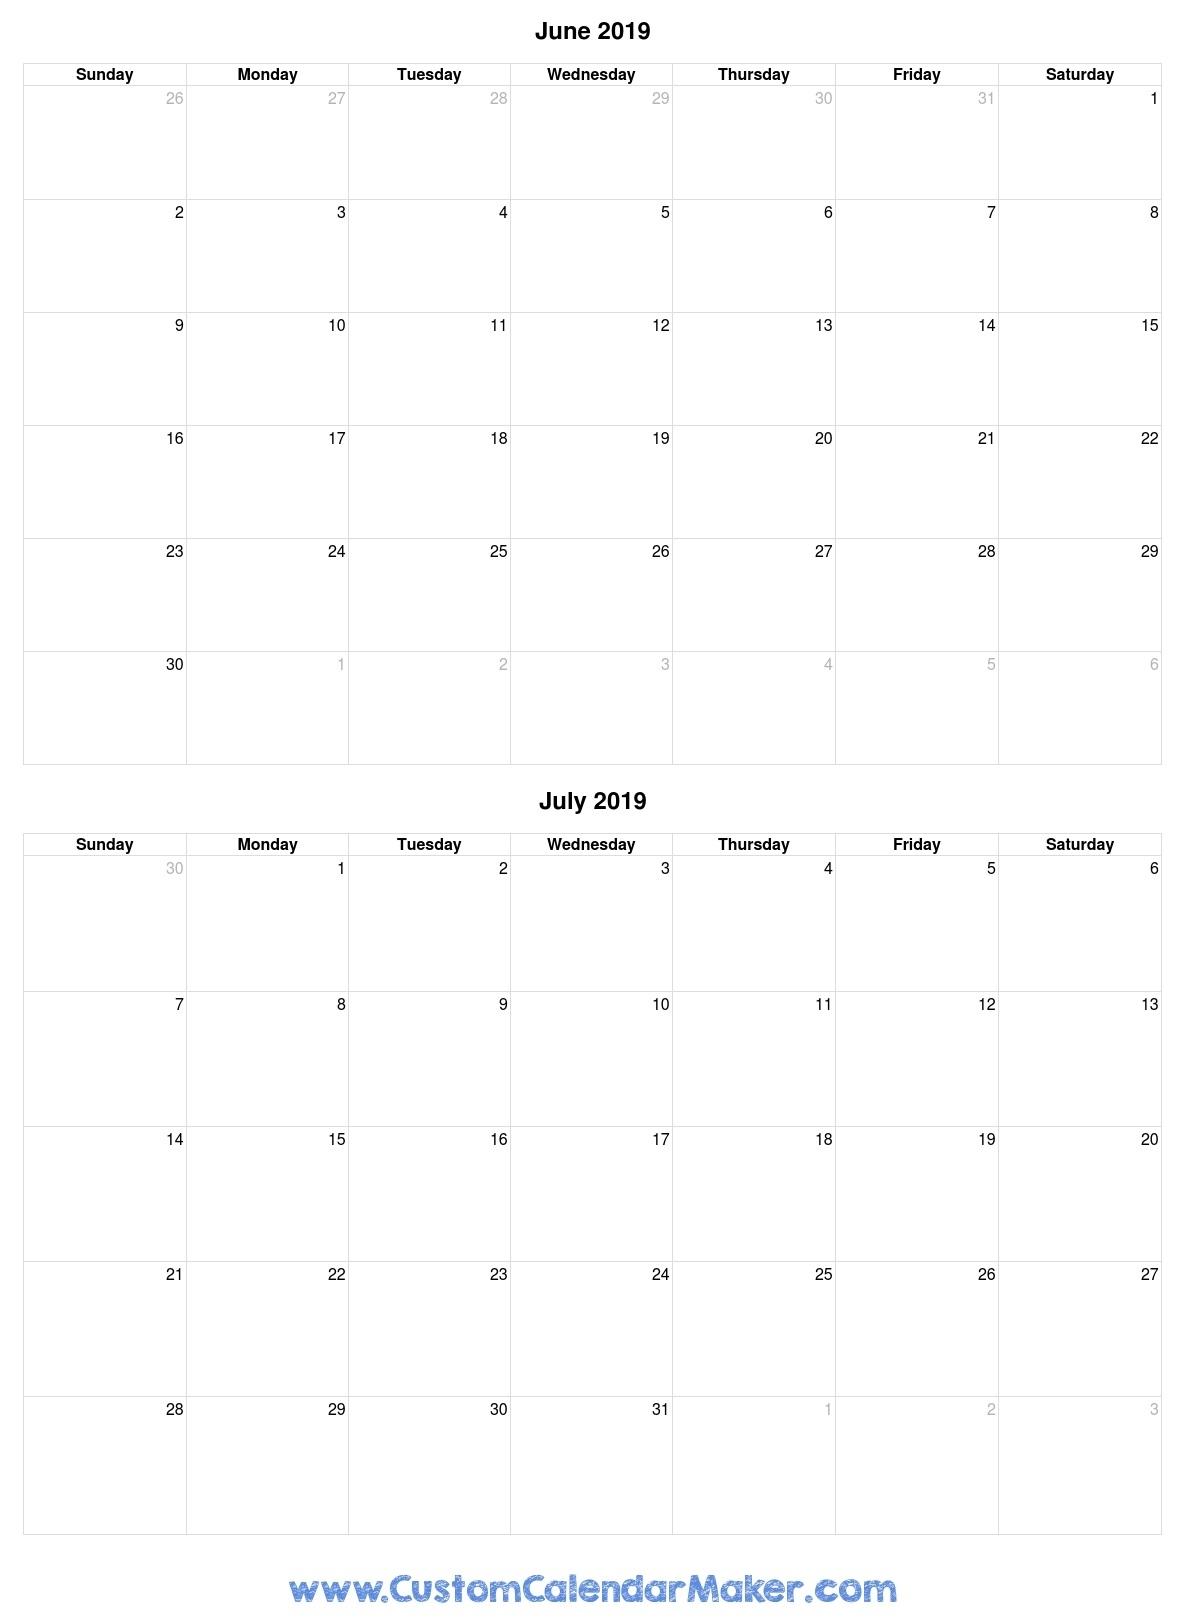 June And July 2019 Free Printable Calendar Template in Calendar For June July